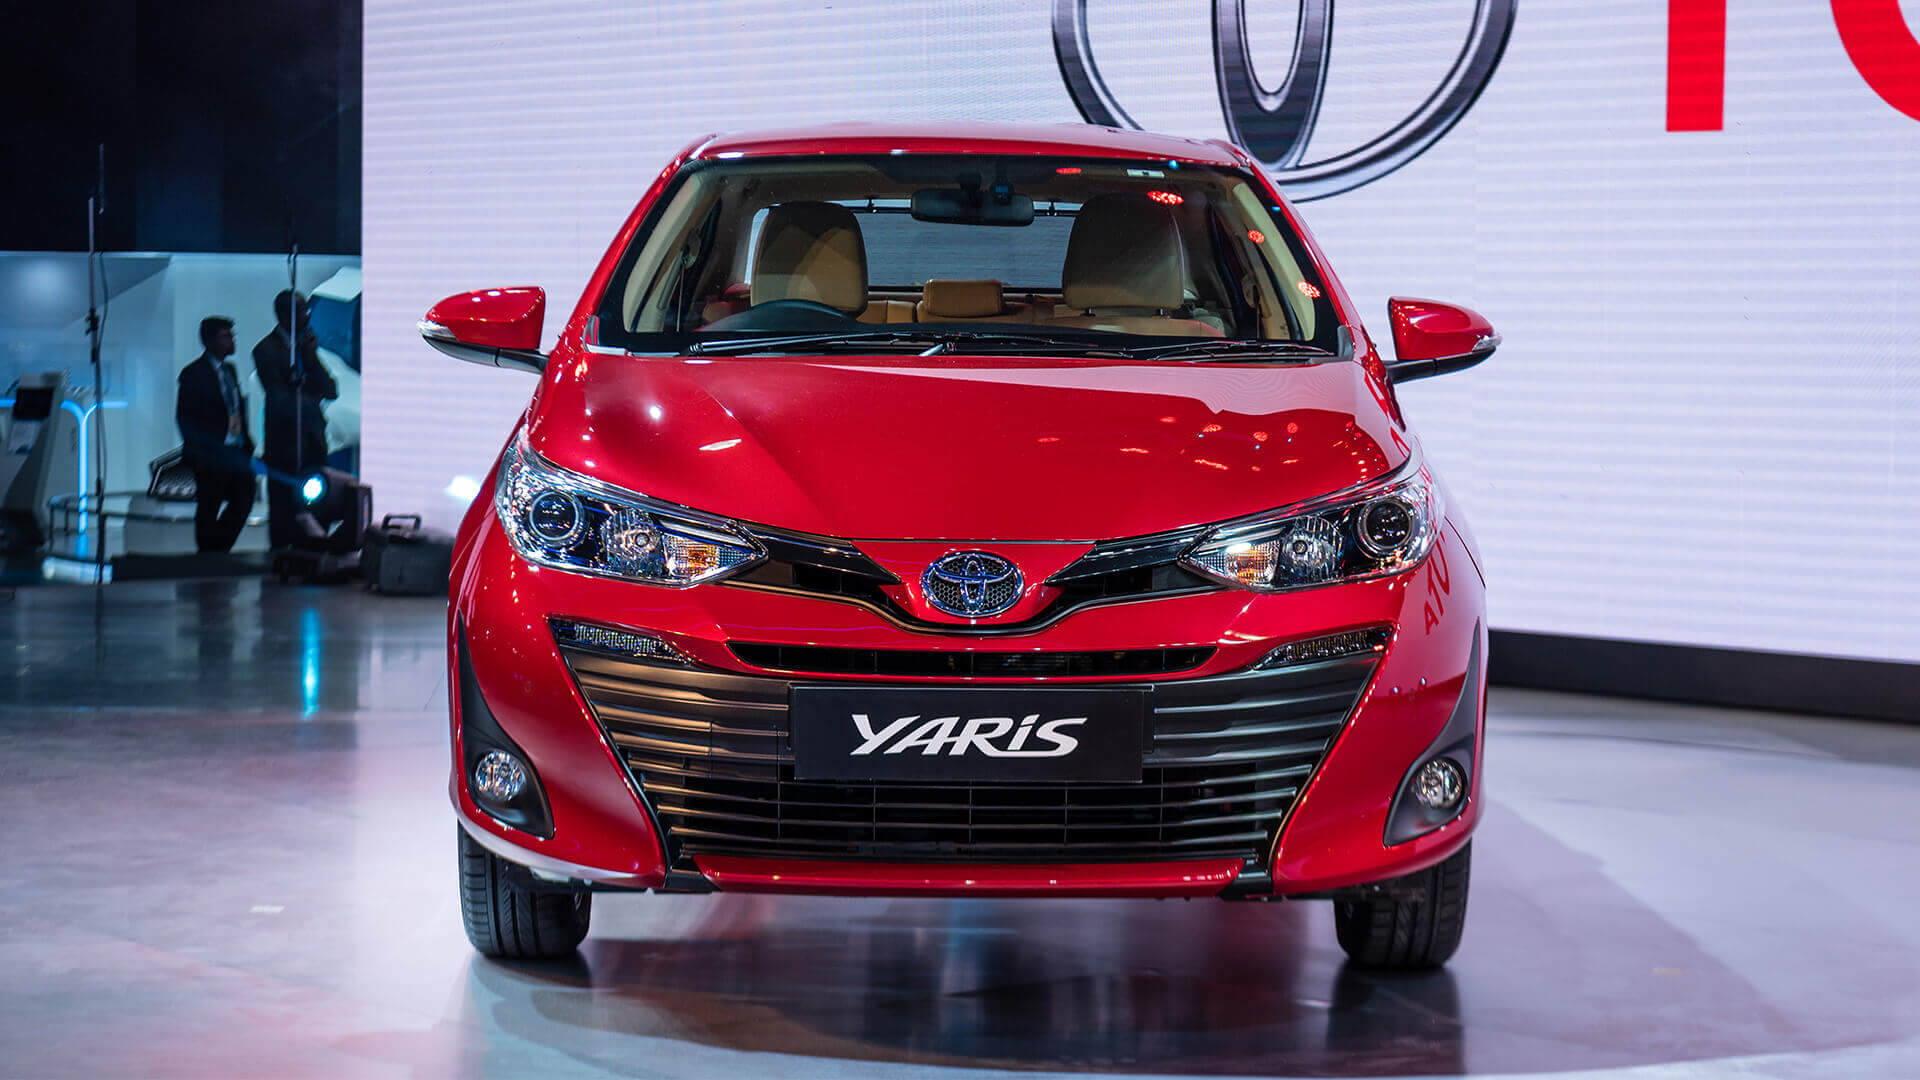 Toyota-Yaris-India-Auto-Expo-2018_2